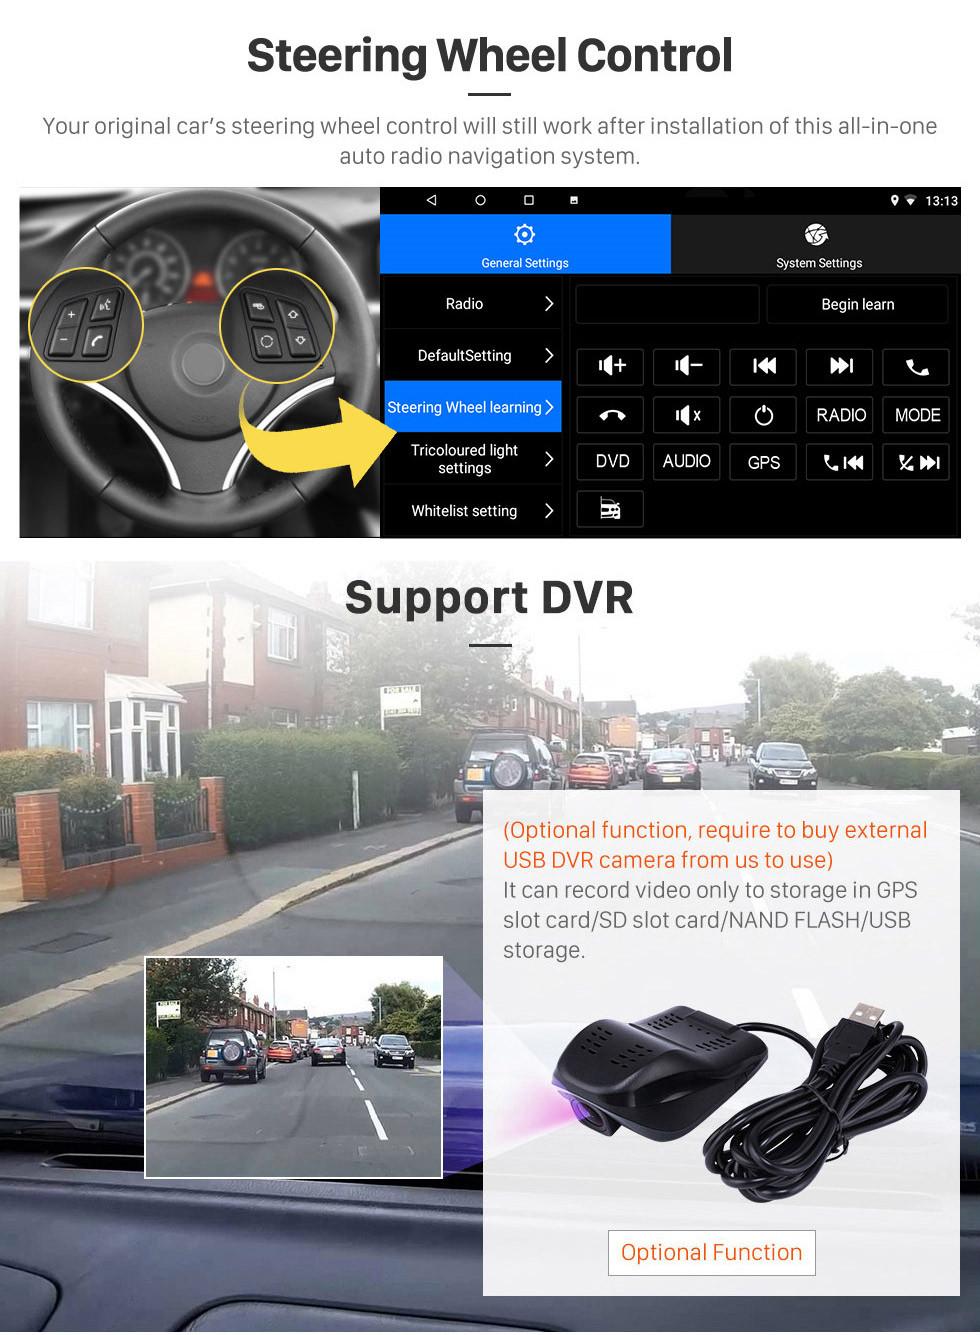 Seicane 9-дюймовый Android 10.0 GPS-навигатор для 2018 Seat Ibiza с Bluetooth USB WIFI HD Поддержка сенсорного экрана TPMS Carplay DVR